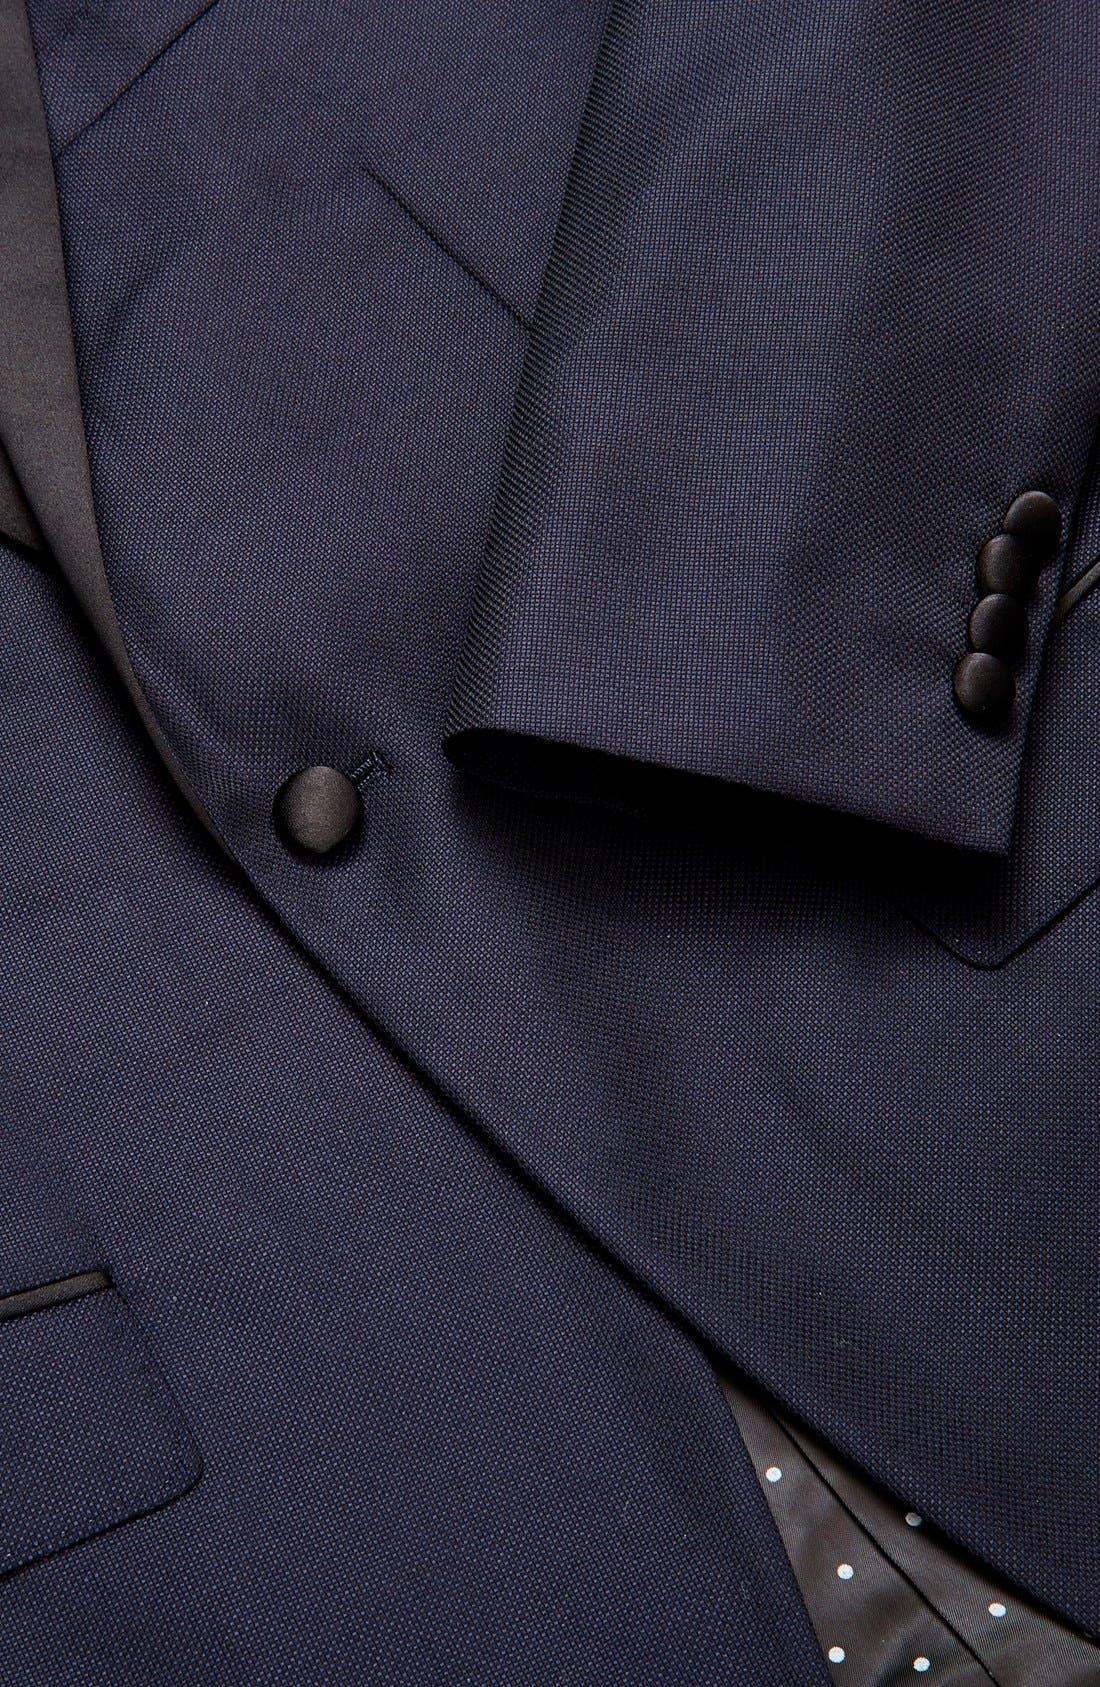 Trim Fit Wool Dinner Jacket,                             Alternate thumbnail 3, color,                             Navy Hopsack